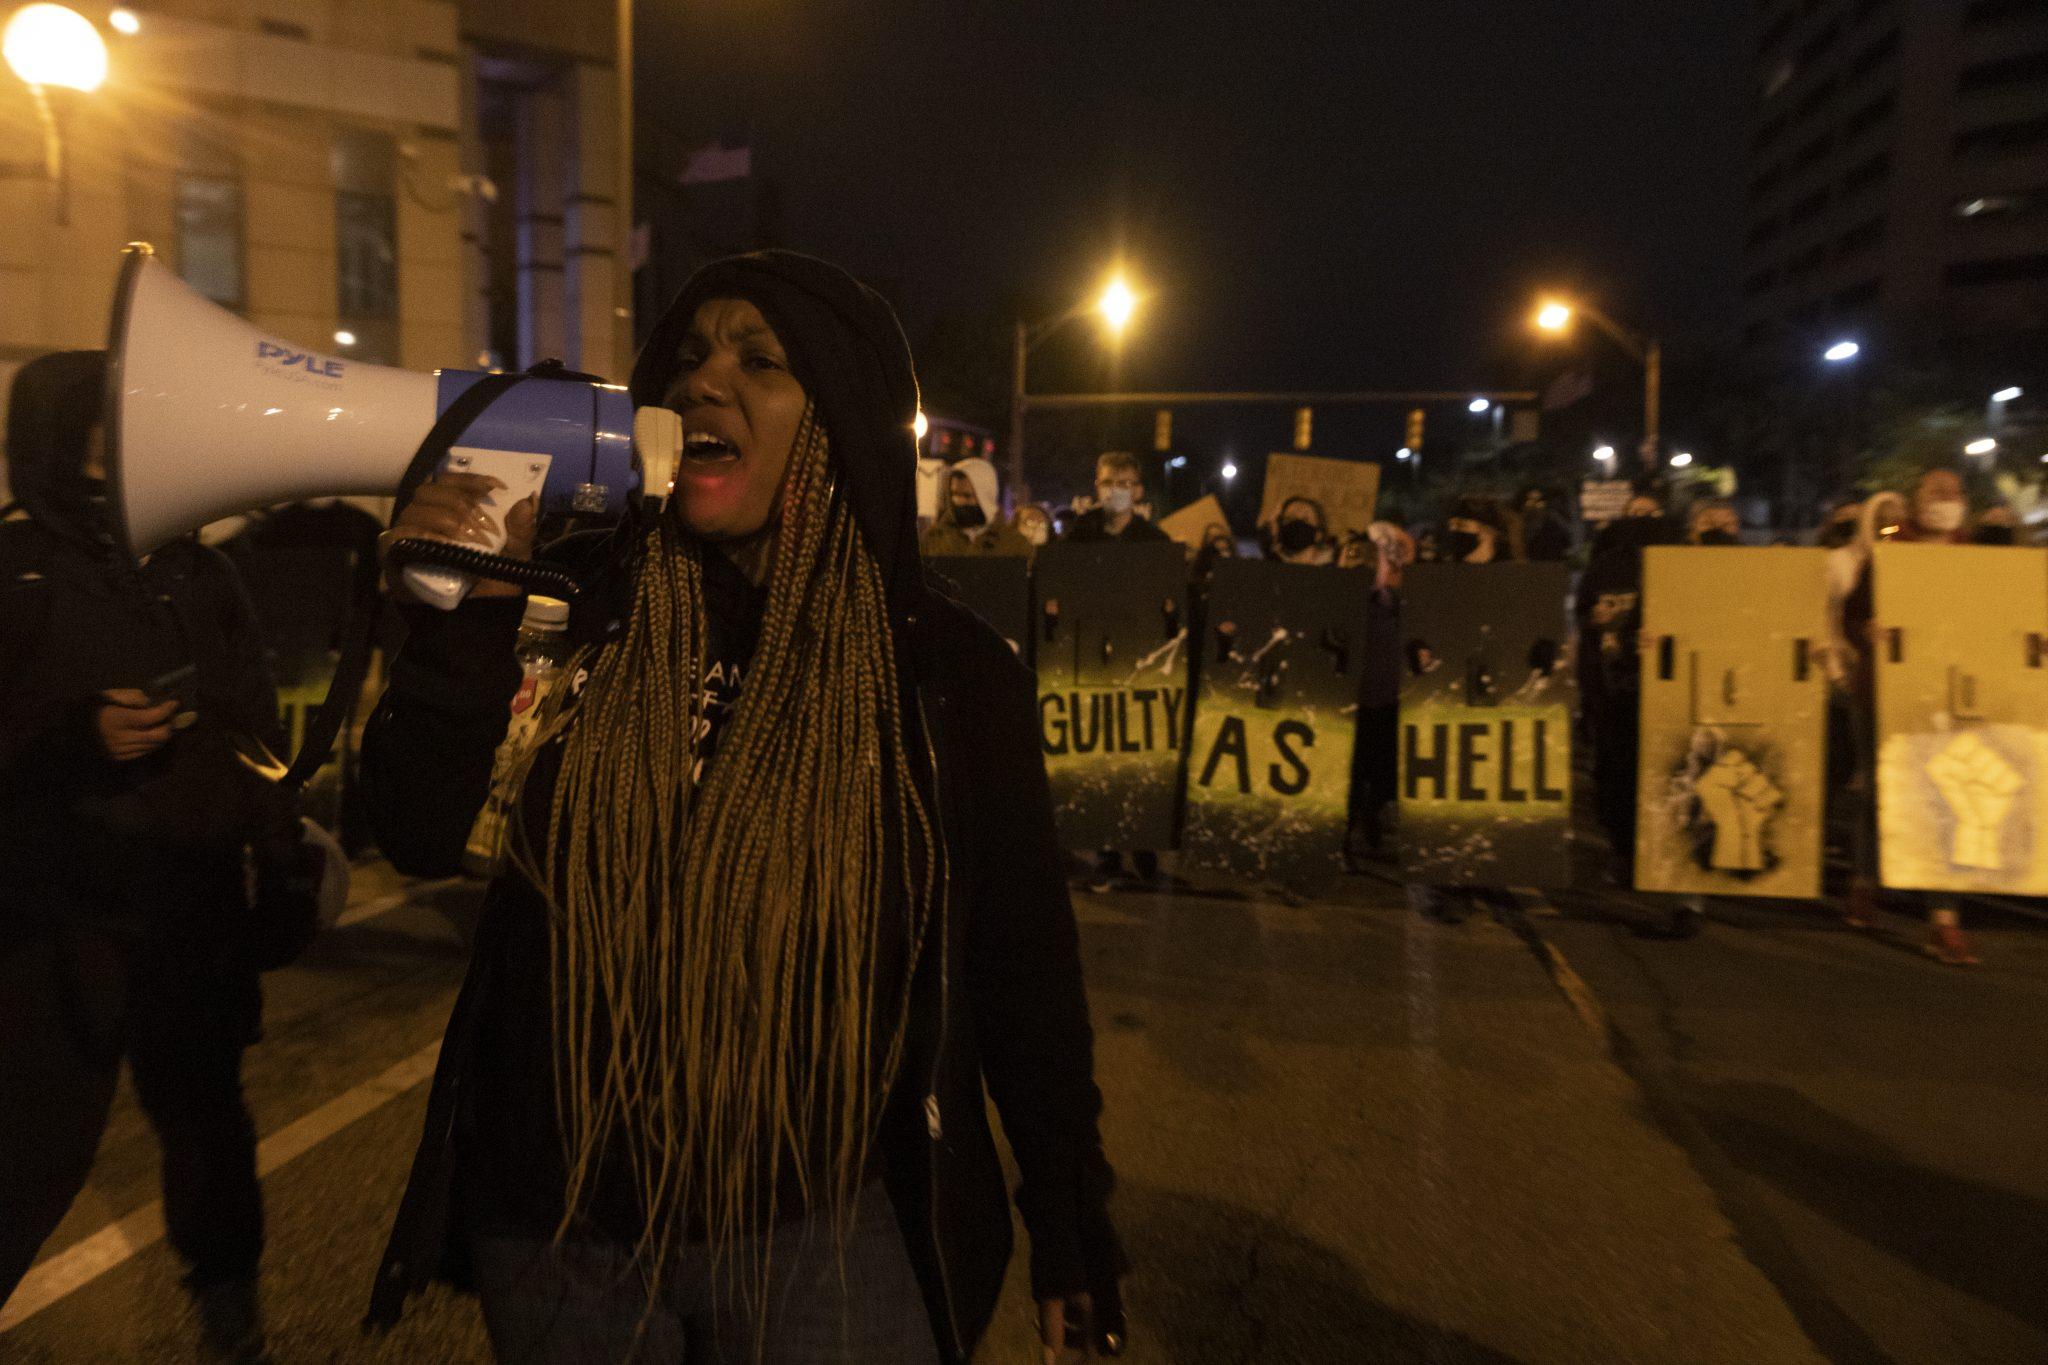 Columbus police shoot, kill teen girl, reports say